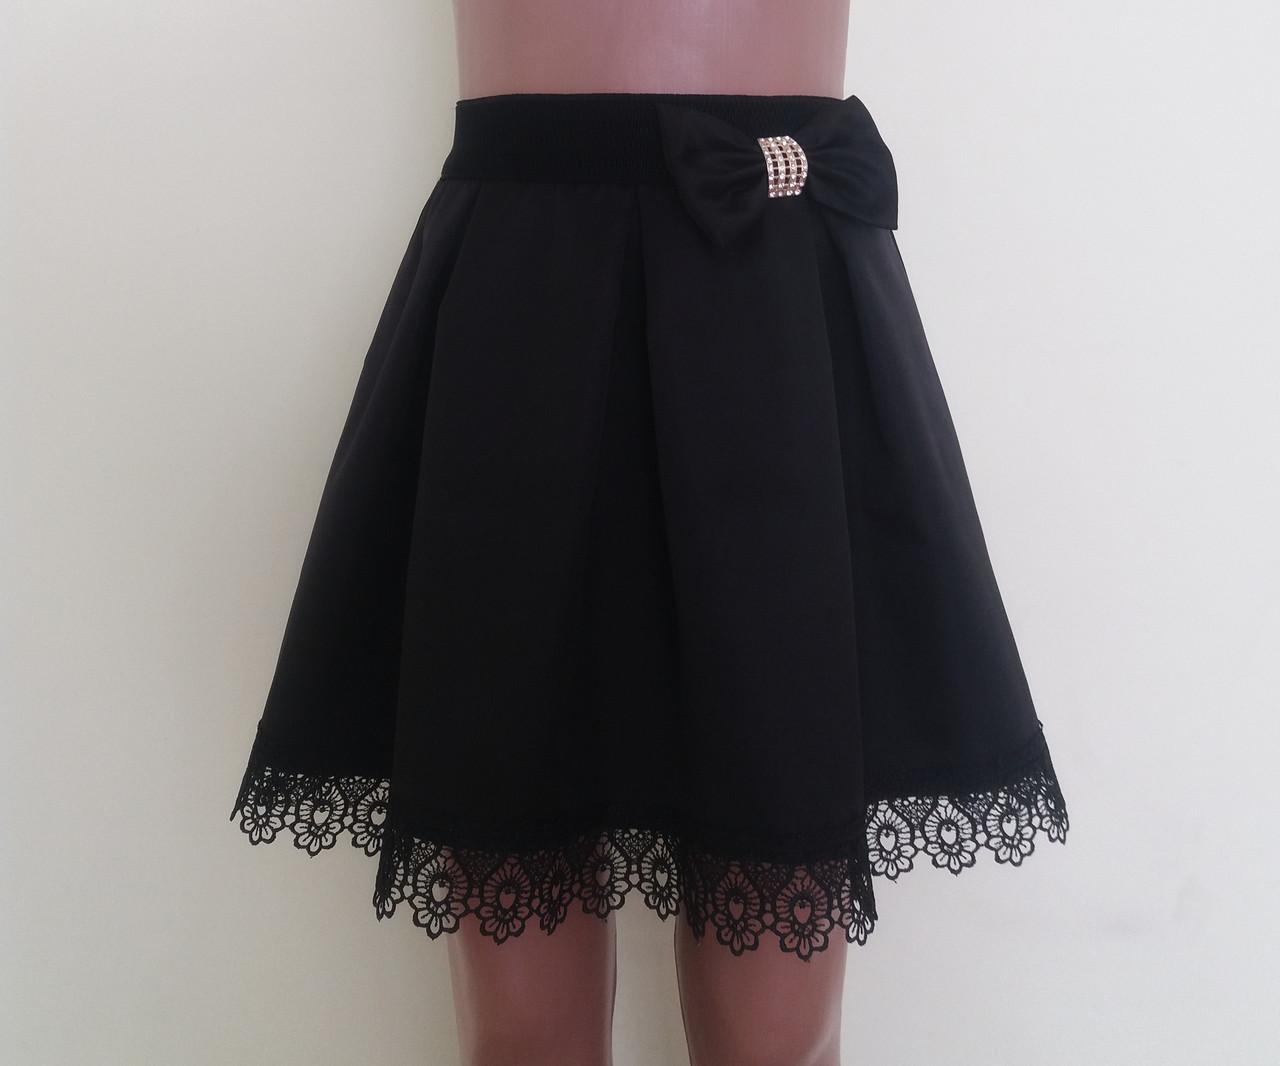 b035f5b1a43 Детская школьная юбка на резинке «Арка»